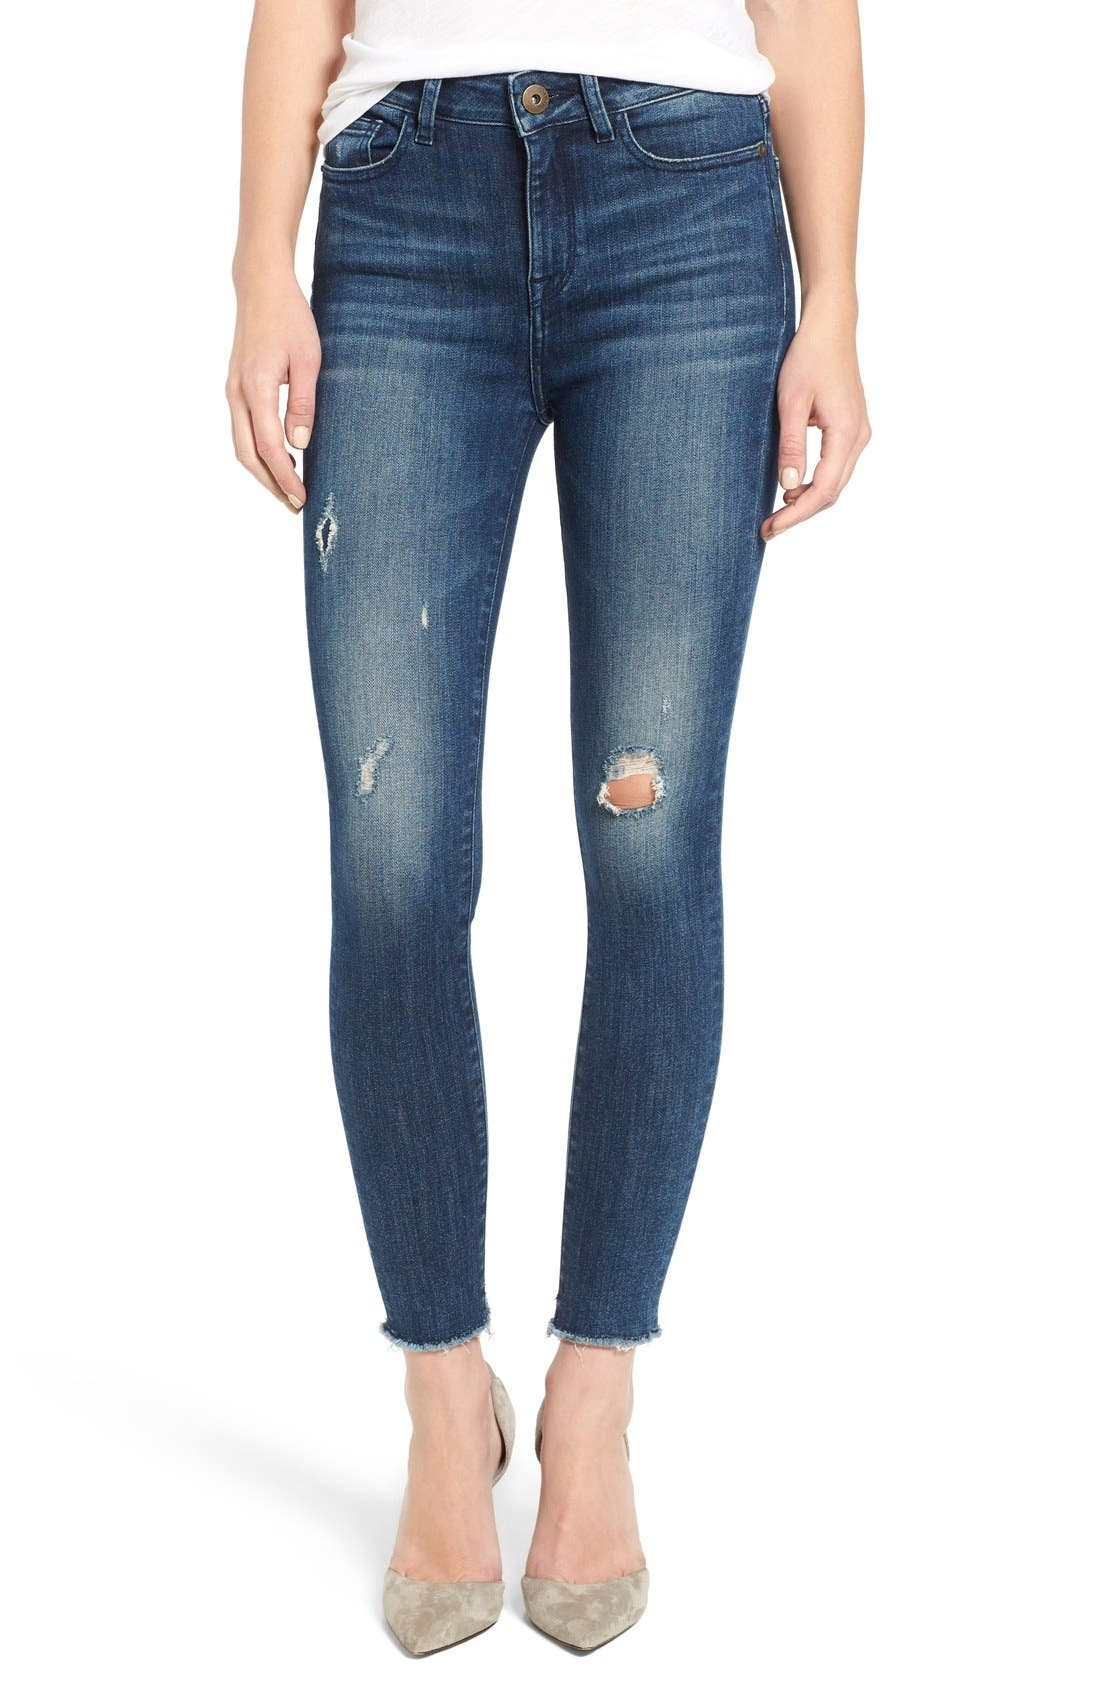 DL1961 Ryan High Waist Skinny Jeans